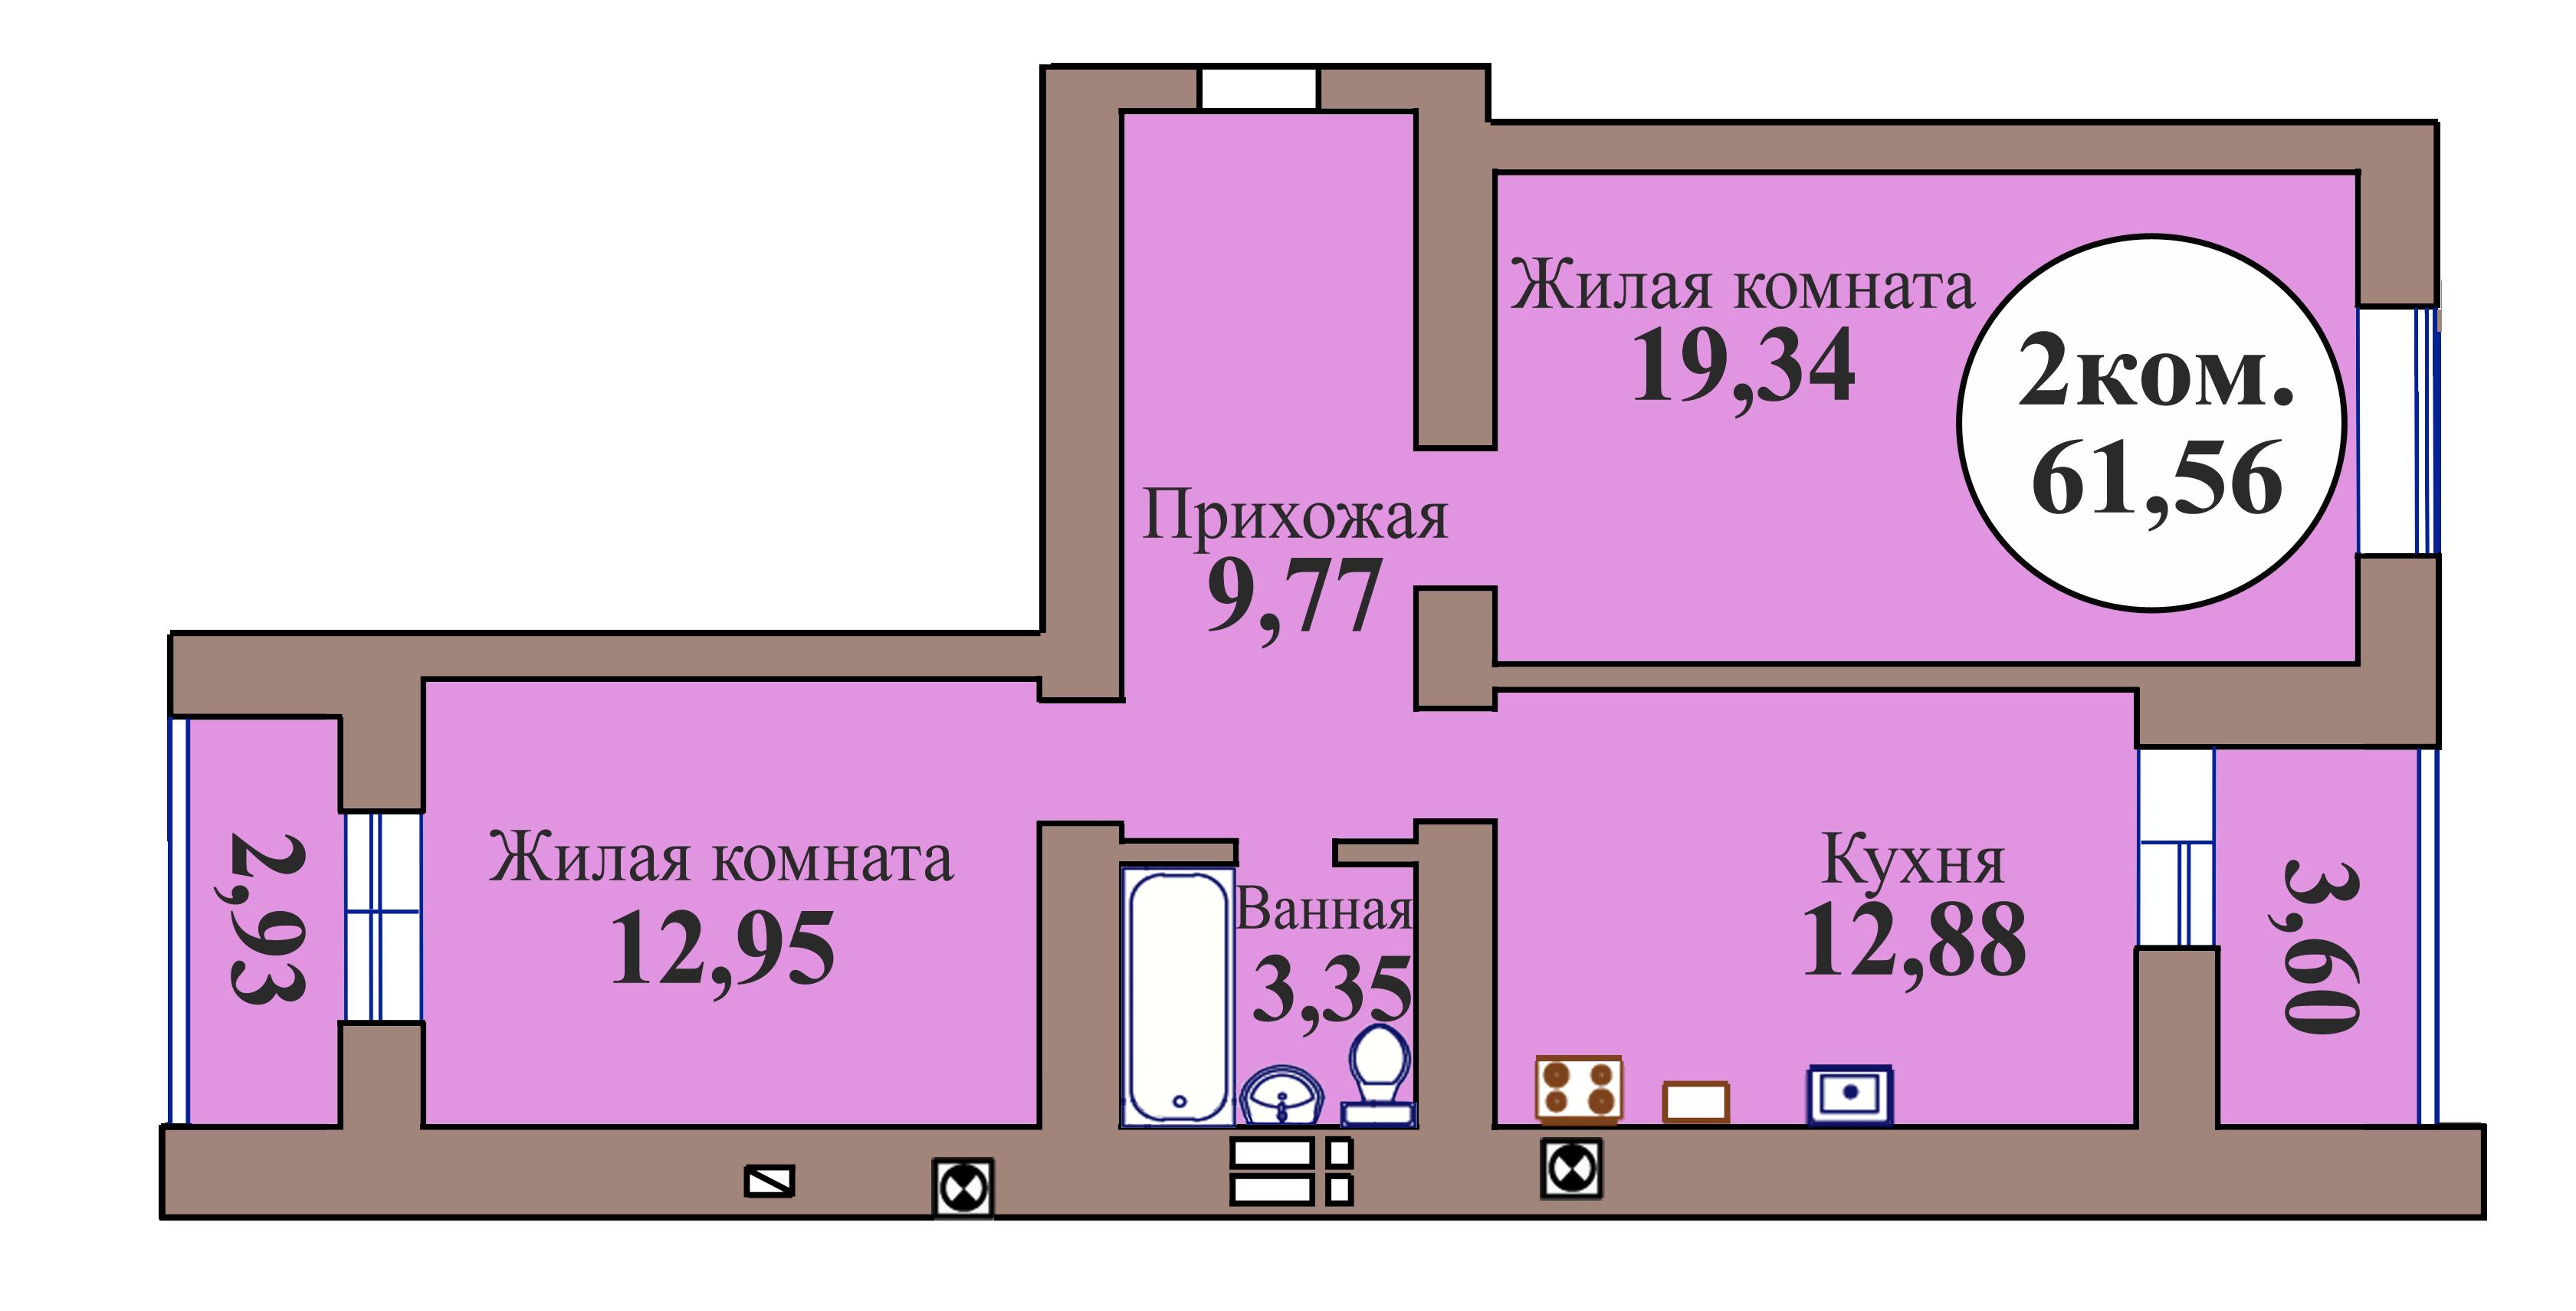 2-комн. кв. по пер. Калининградский, 5 кв. 125 в Калининграде